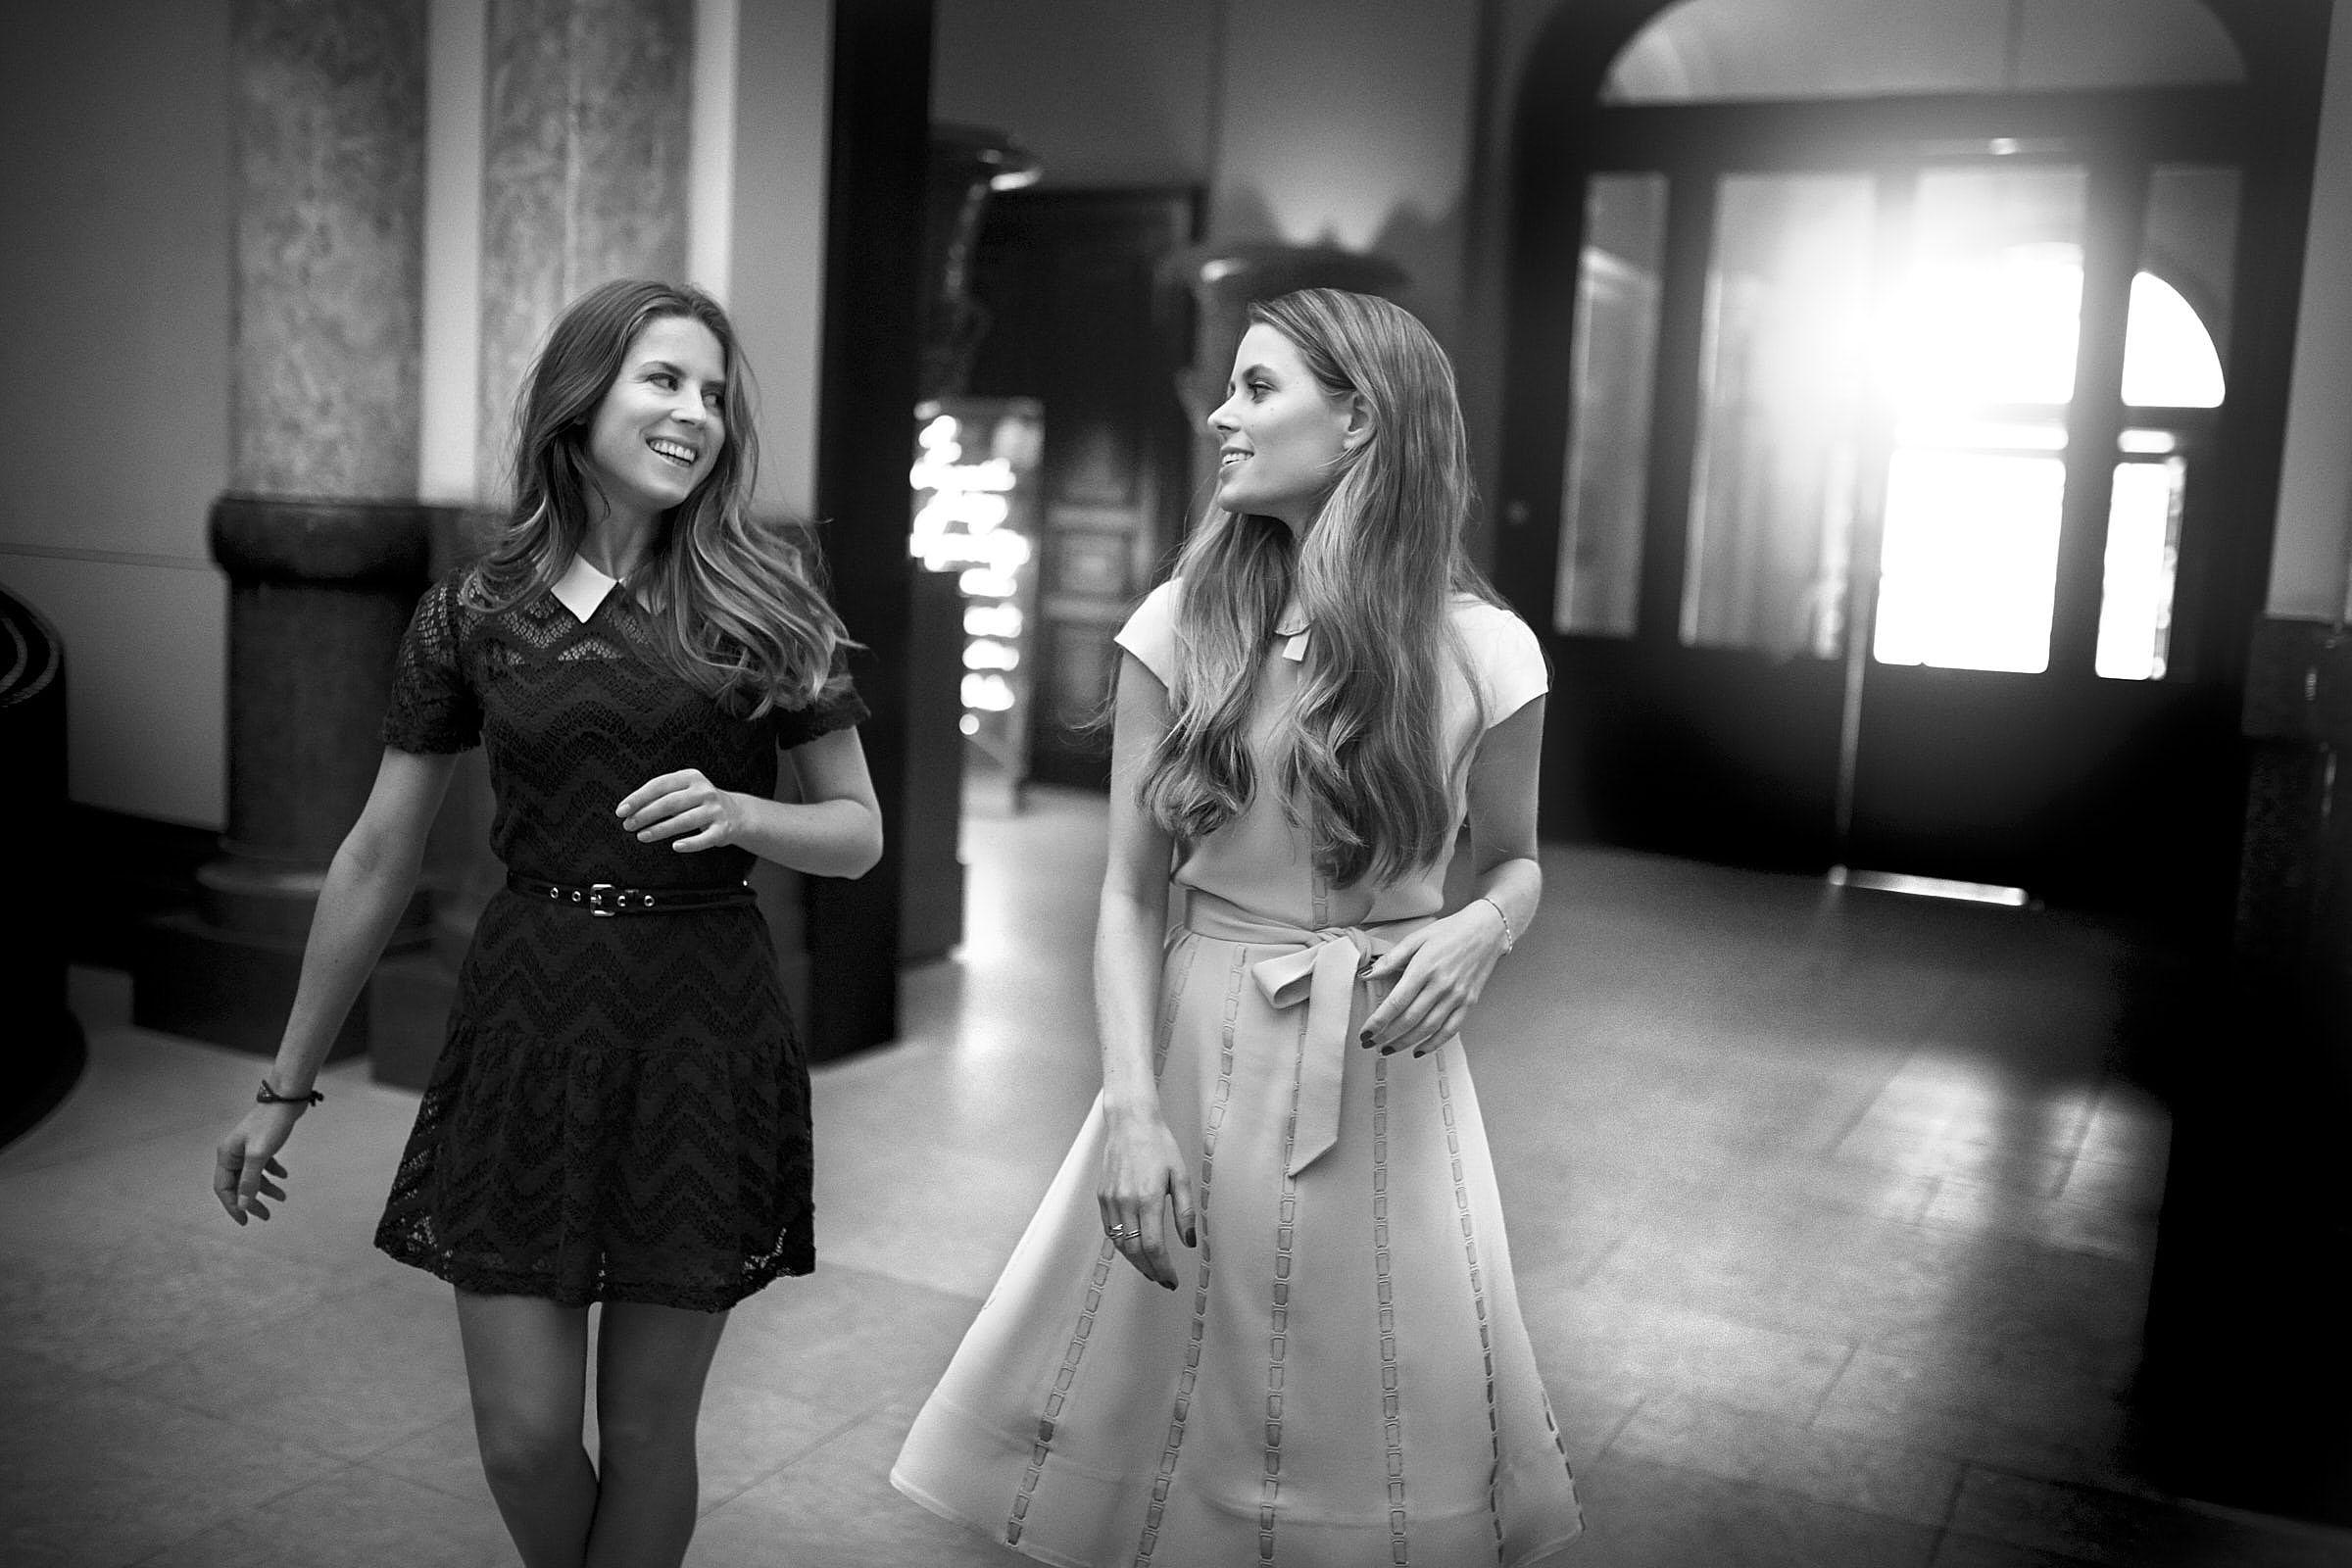 Lydia & Irene Forte im Foyer des Hotel de Rome Berlin am 10.03.2015